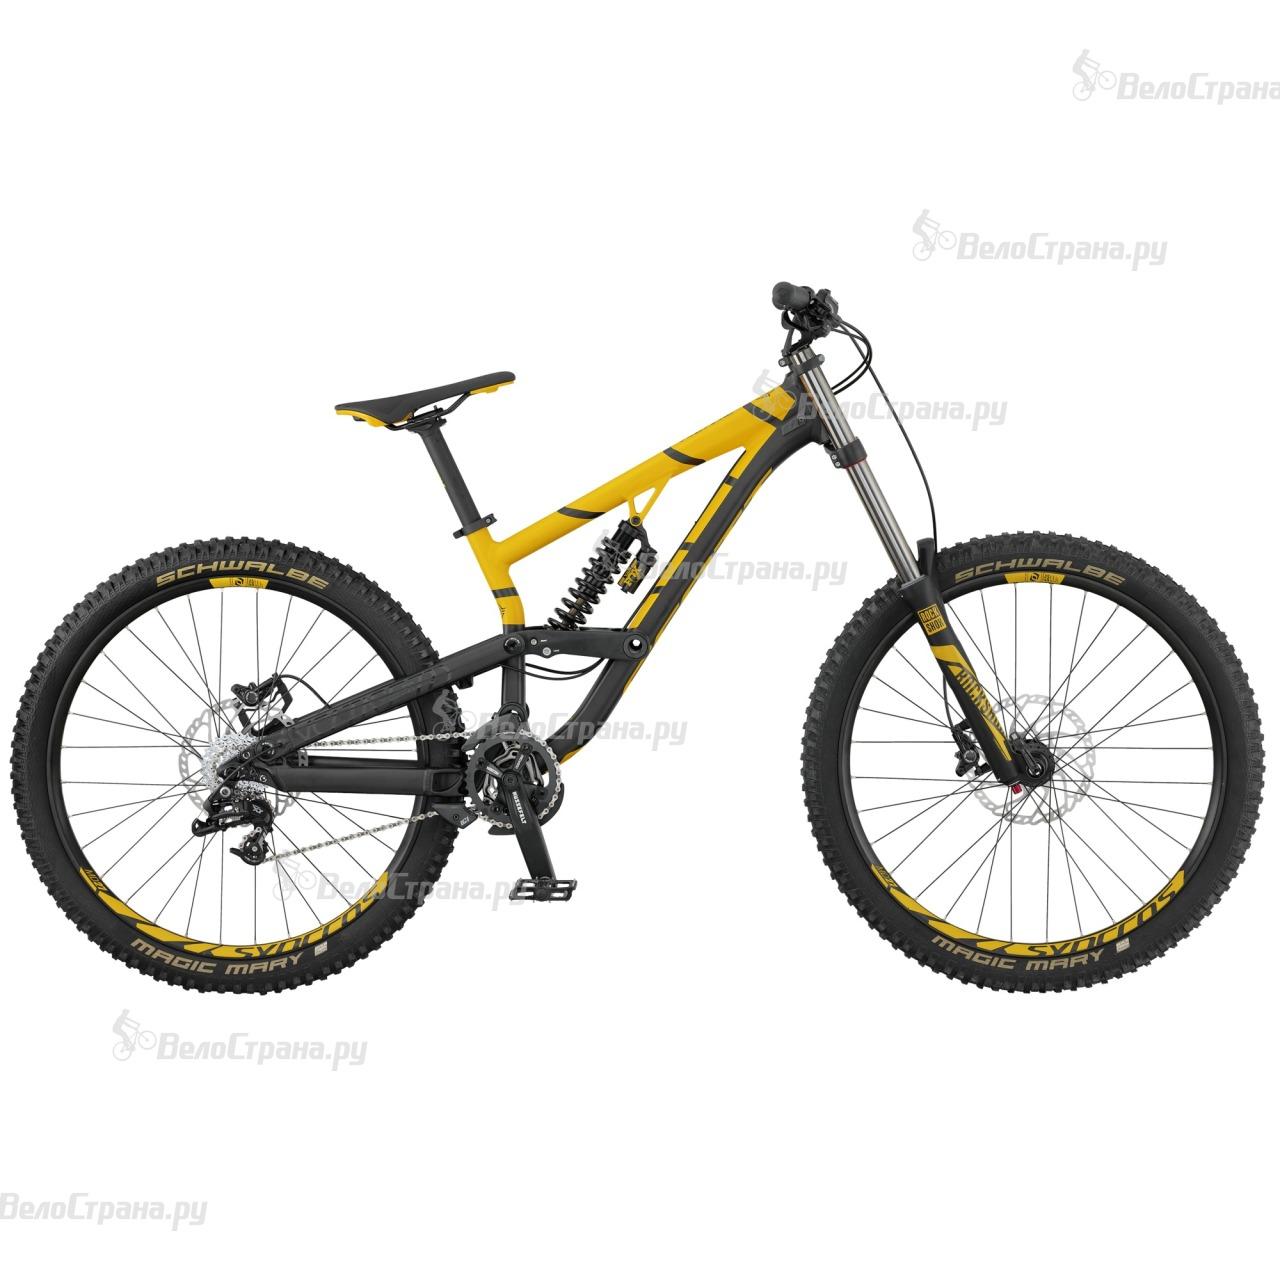 Велосипед Scott Voltage FR 720 (2017)